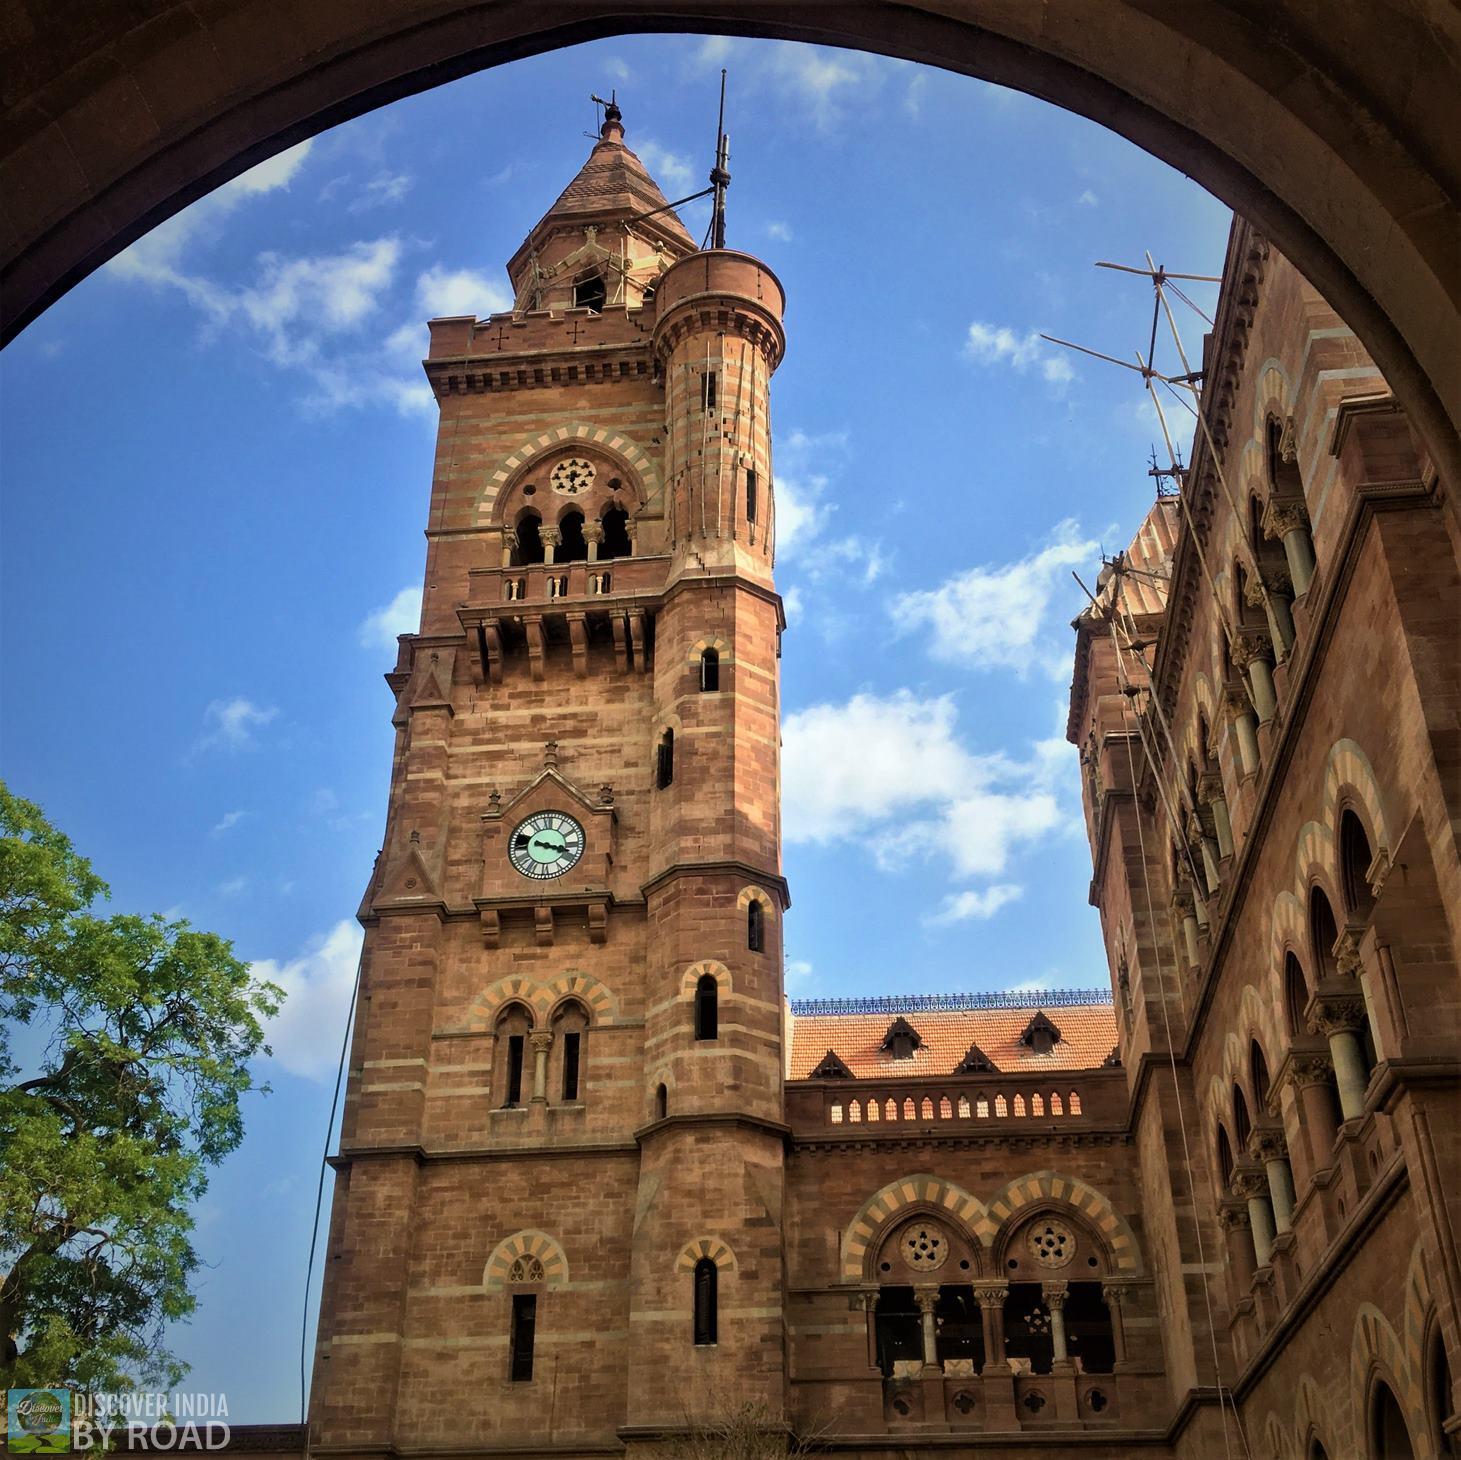 Bing Bang Clock Tower of Prag Mahal Palace